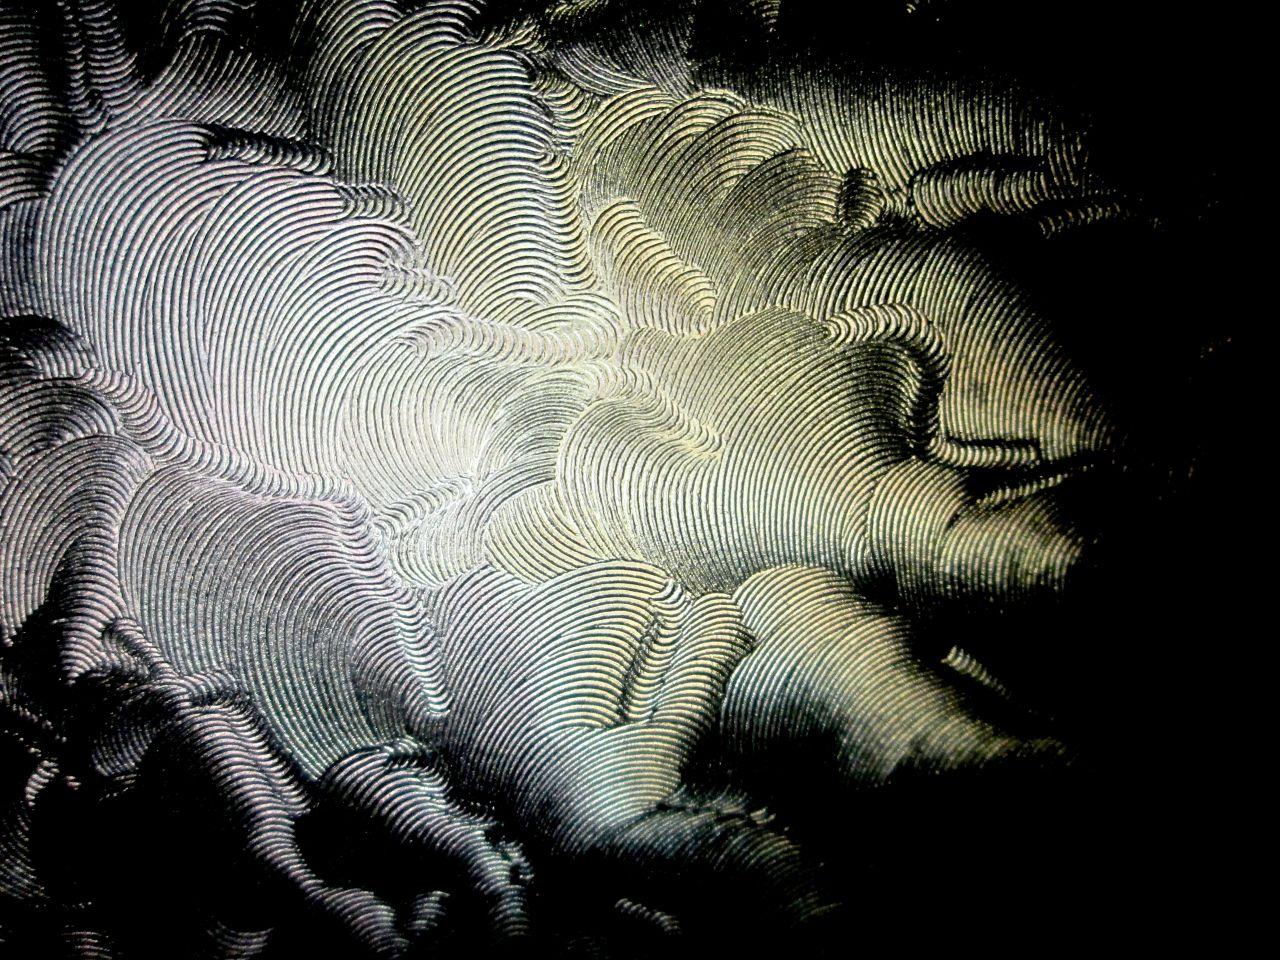 07-Magia-dellaluce